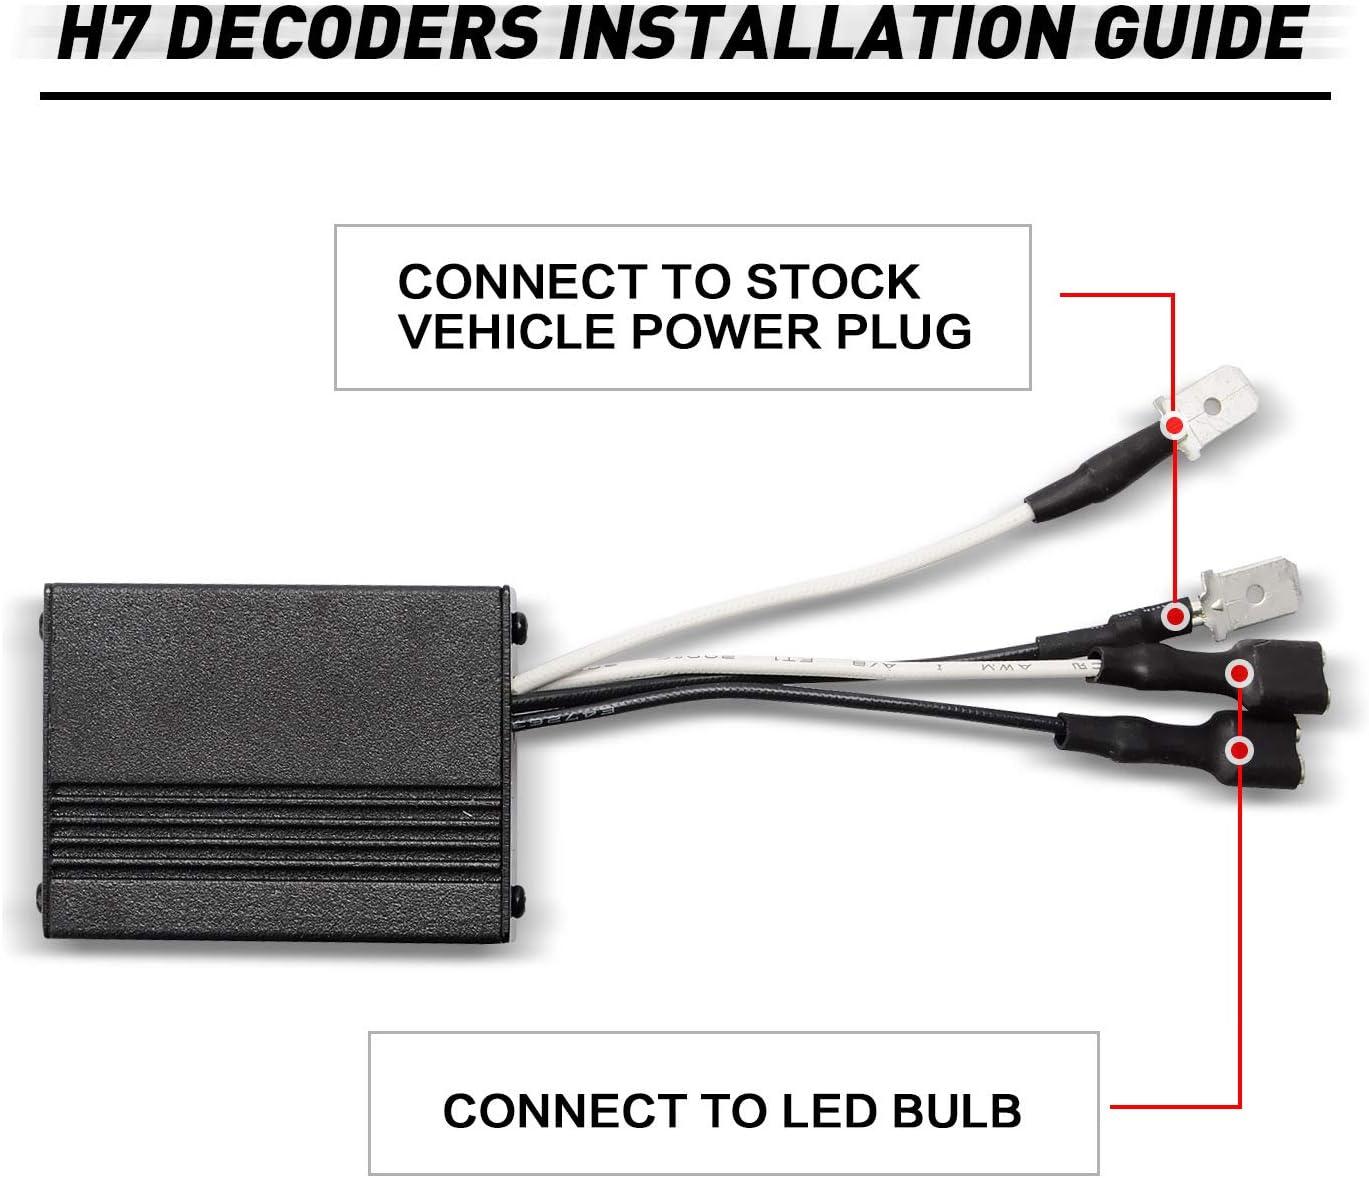 O-NEX LED Widerstand Kit H7 Relais Harness Adapter Anti Flicker Fehler Decoder Warnung Canceller